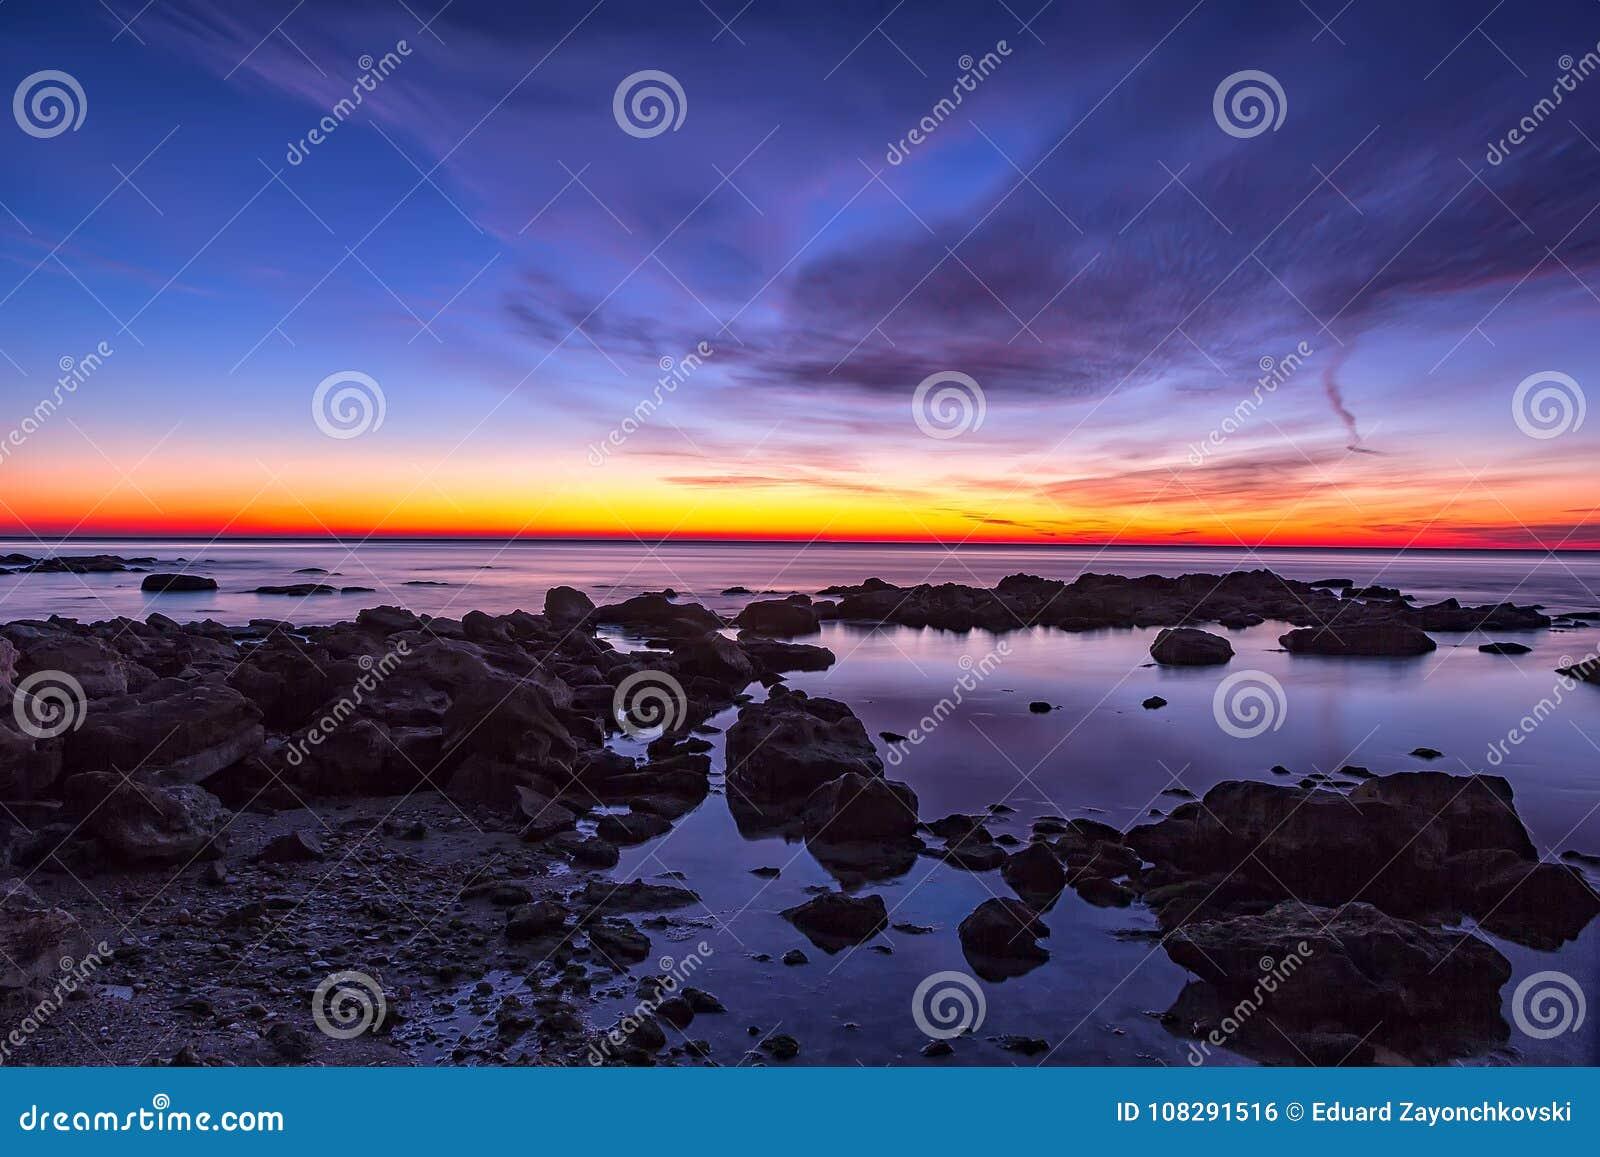 Vóór zonsopgang over het overzees